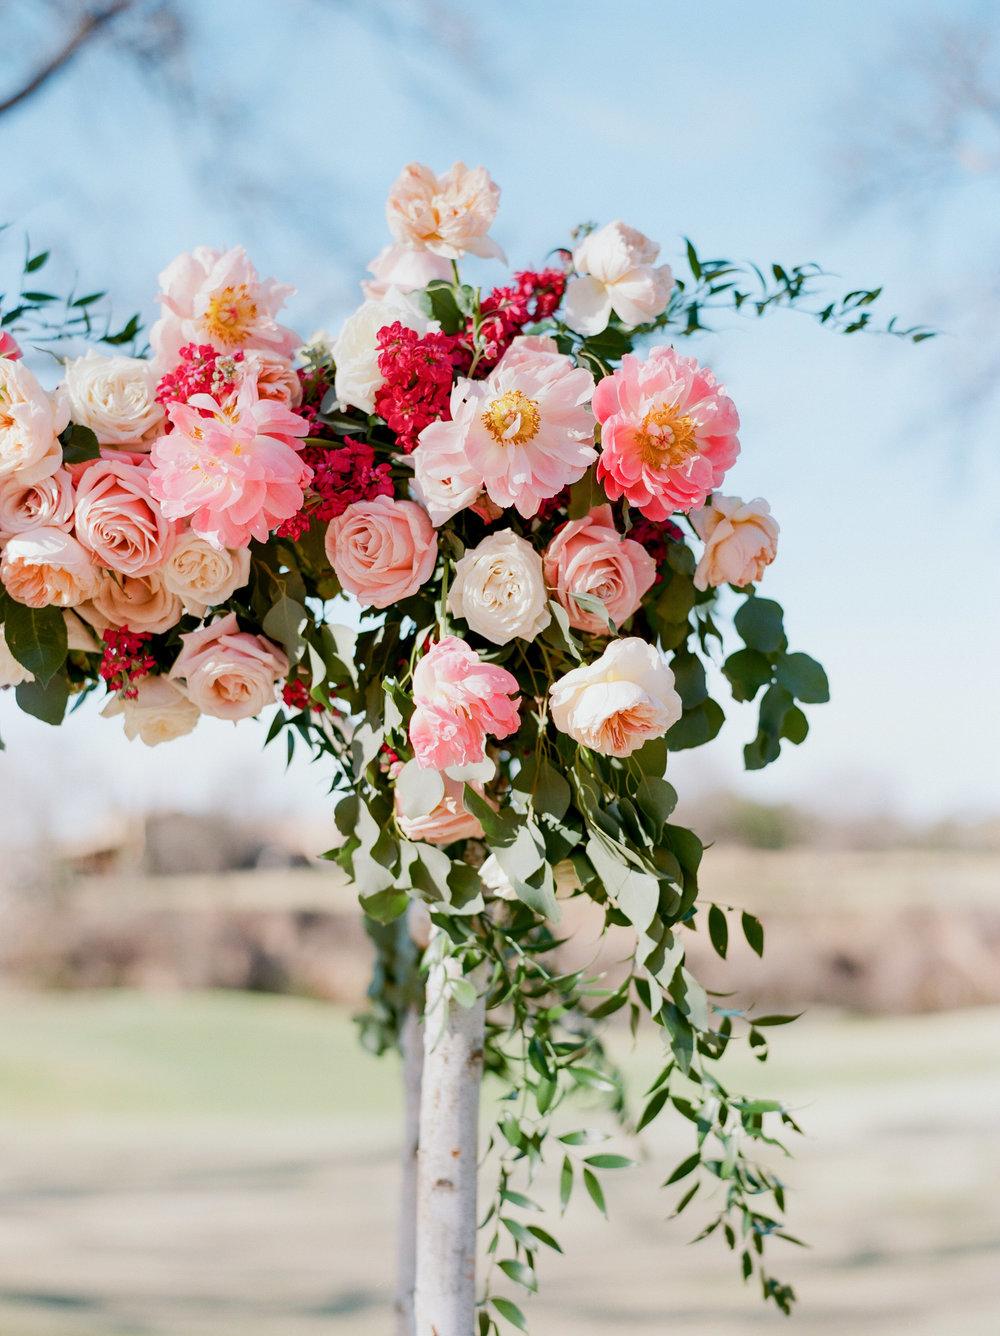 Escondido-Golf_Lake-Club-Hill-Country-Houston-Wedding-Photographer-Best-Top-Luxury-Destination-Engagements-Portrait-Austin-Photography-79.jpg